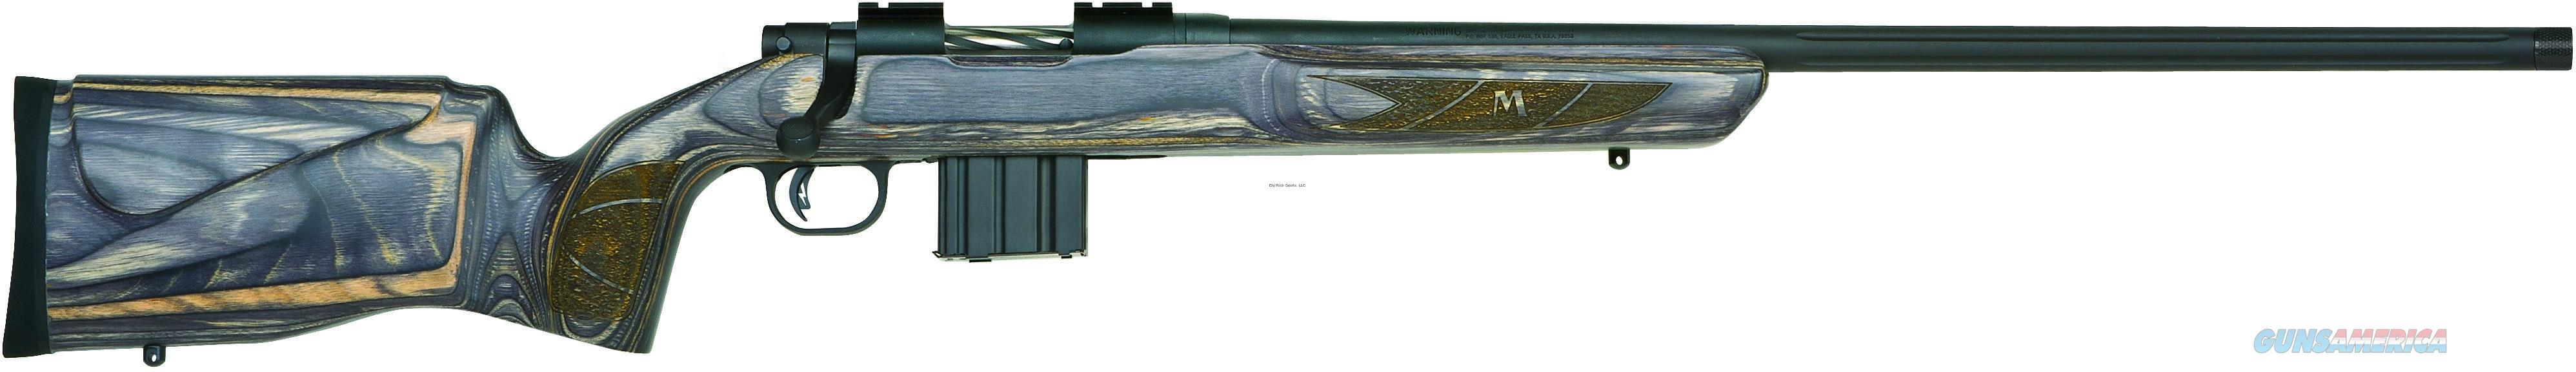 Mossberg Mvp Varmint 5.56 24''  Bull Threaded 11-Rd 27720  Guns > Rifles > MN Misc Rifles